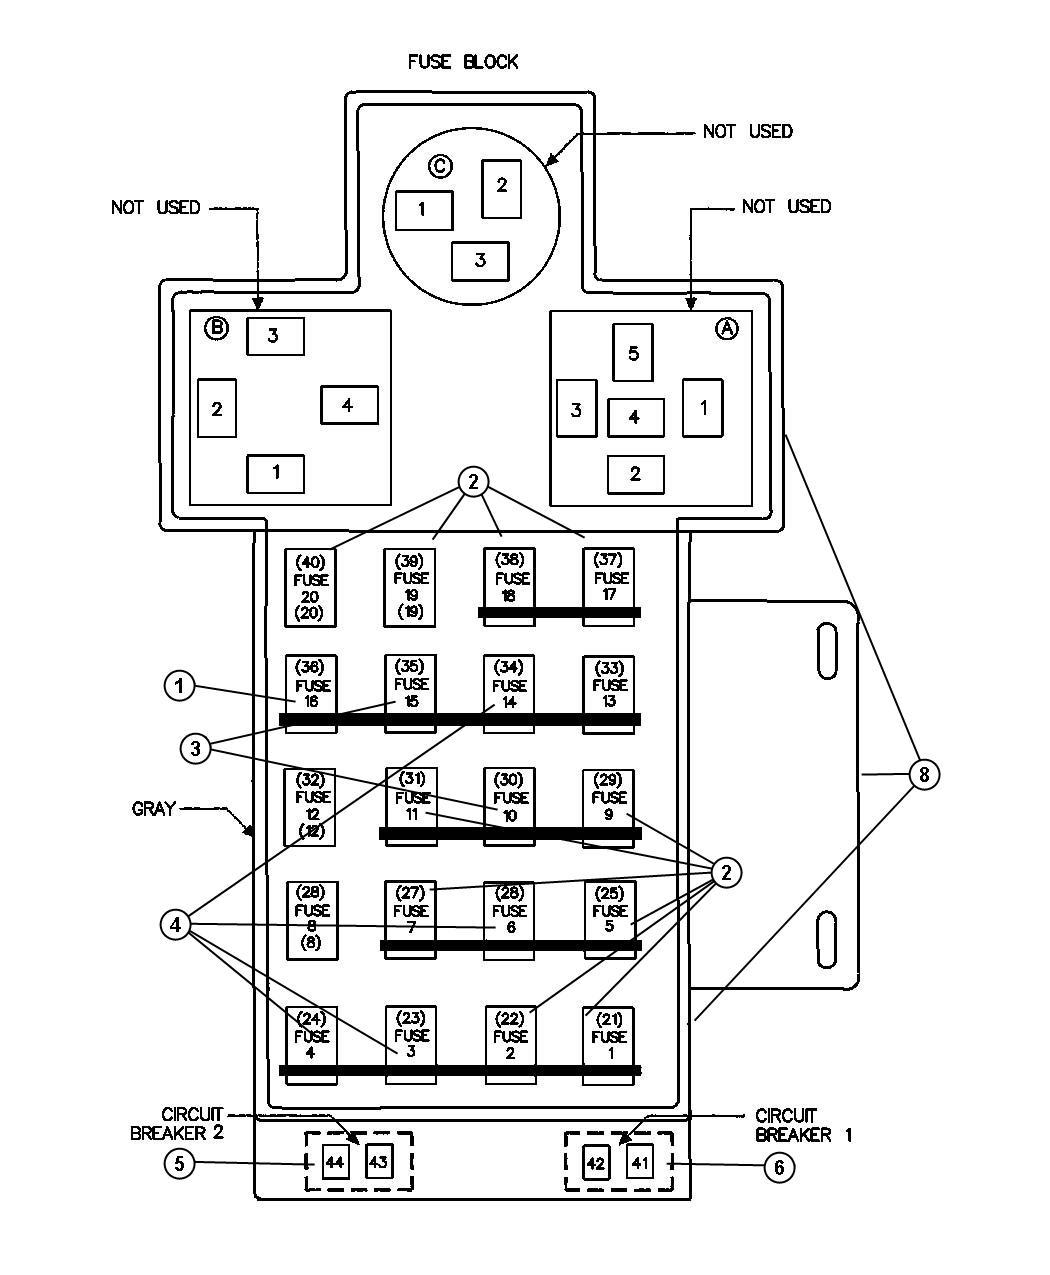 2007 chrysler pt cruiser breaker circuit ampere. Black Bedroom Furniture Sets. Home Design Ideas